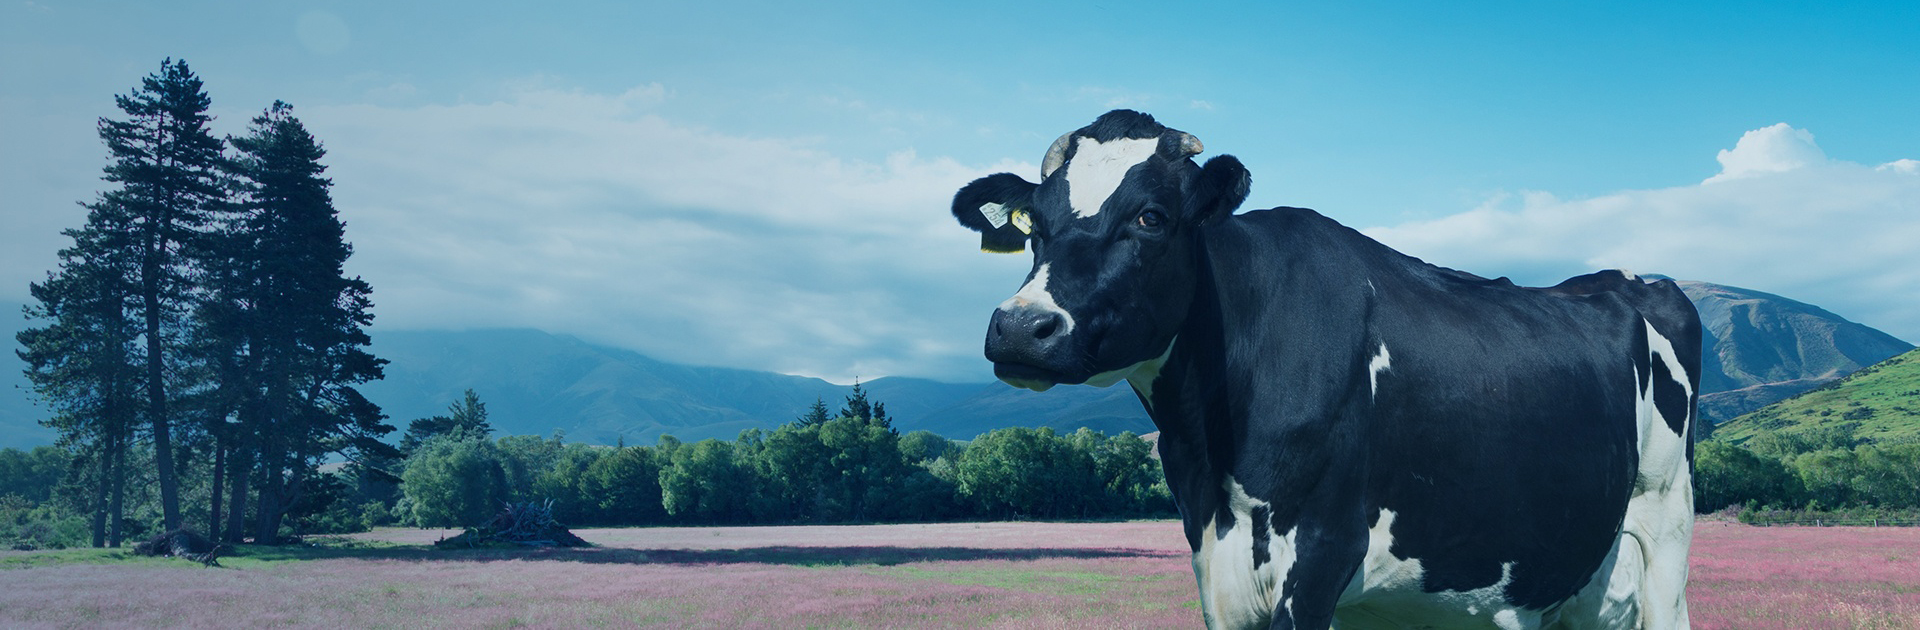 Премиксы для крупнорогатого скота